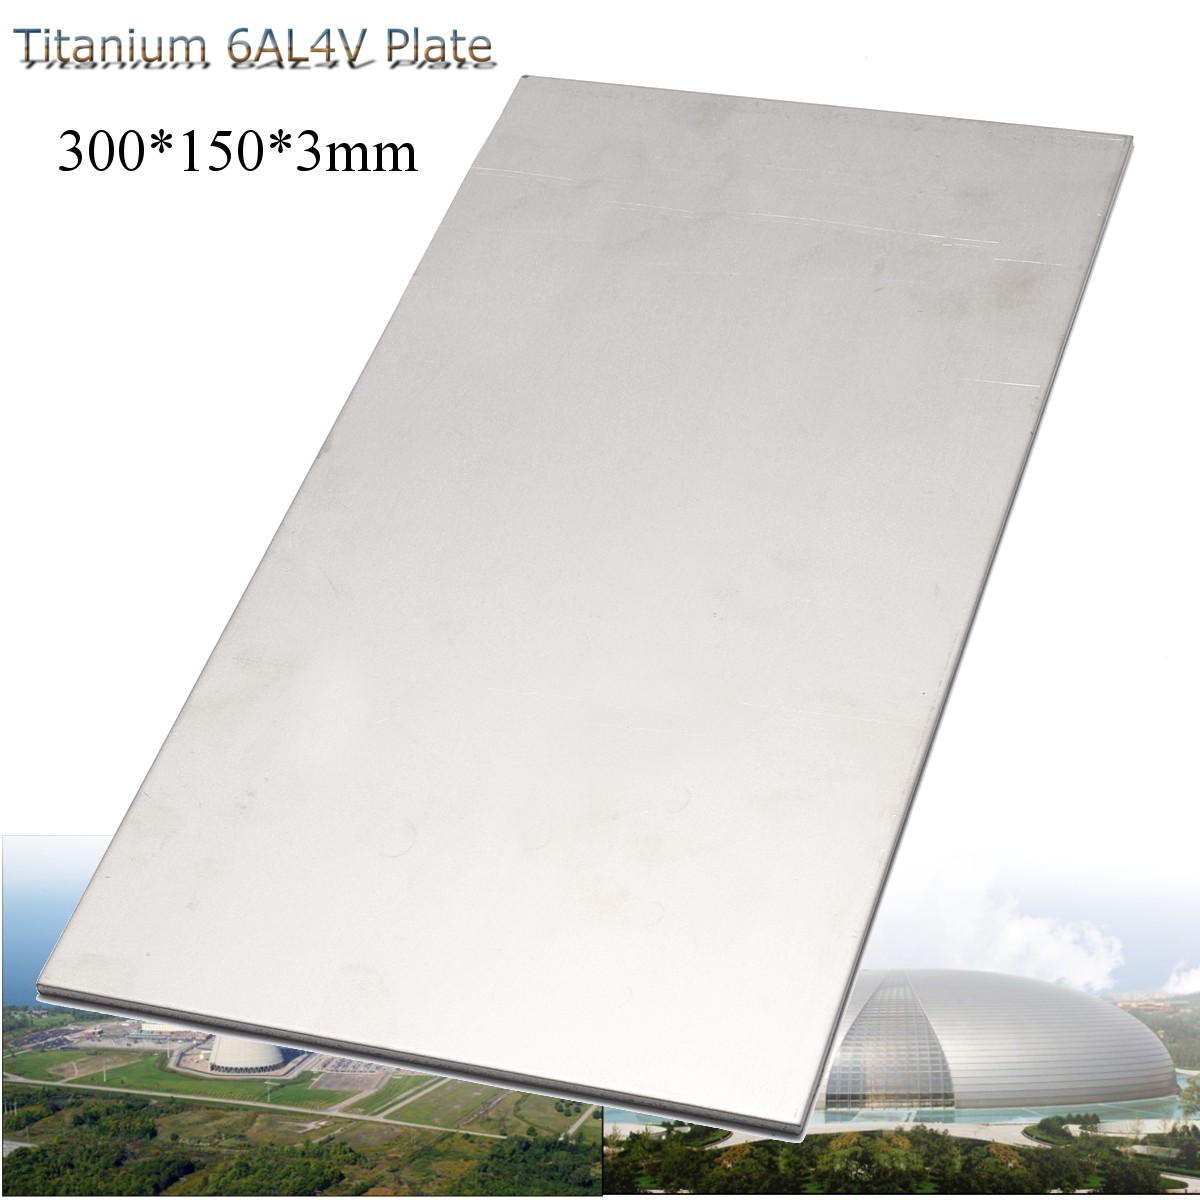 300X150X3mm Thick Titanium 6al-4v Sheet Grade Plate Titanium Metal Sheet Plate Silver Metalwoking Craft Titanium New